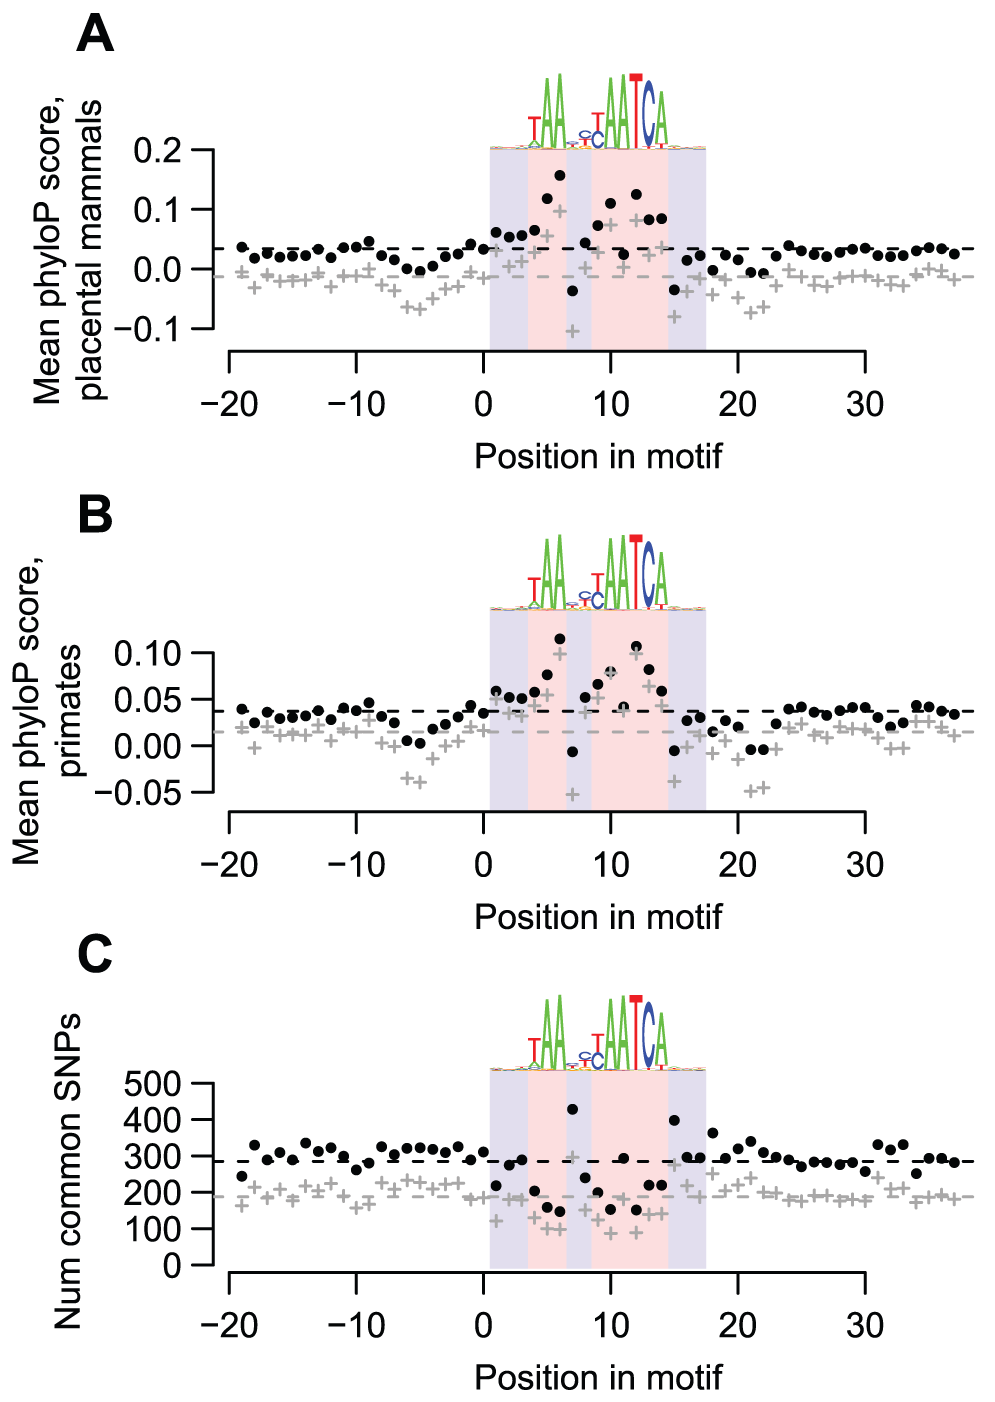 DUX4-bound motifs are evolutionarily conserved.